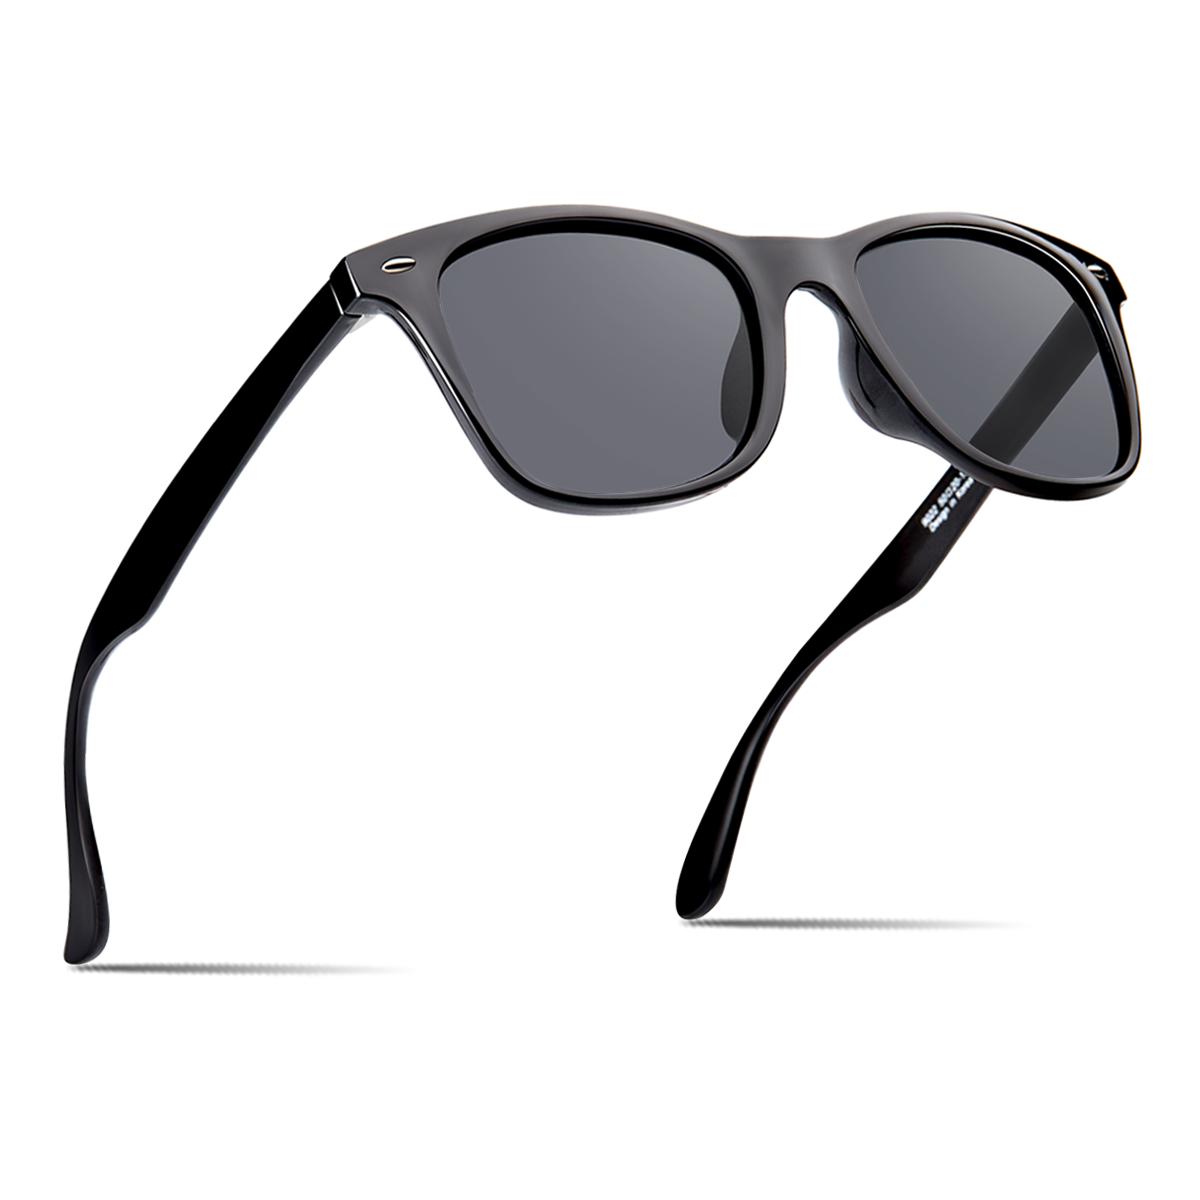 35% OFF High-Quality Polarized Wayfarer Sunglasses Unisex $11.69